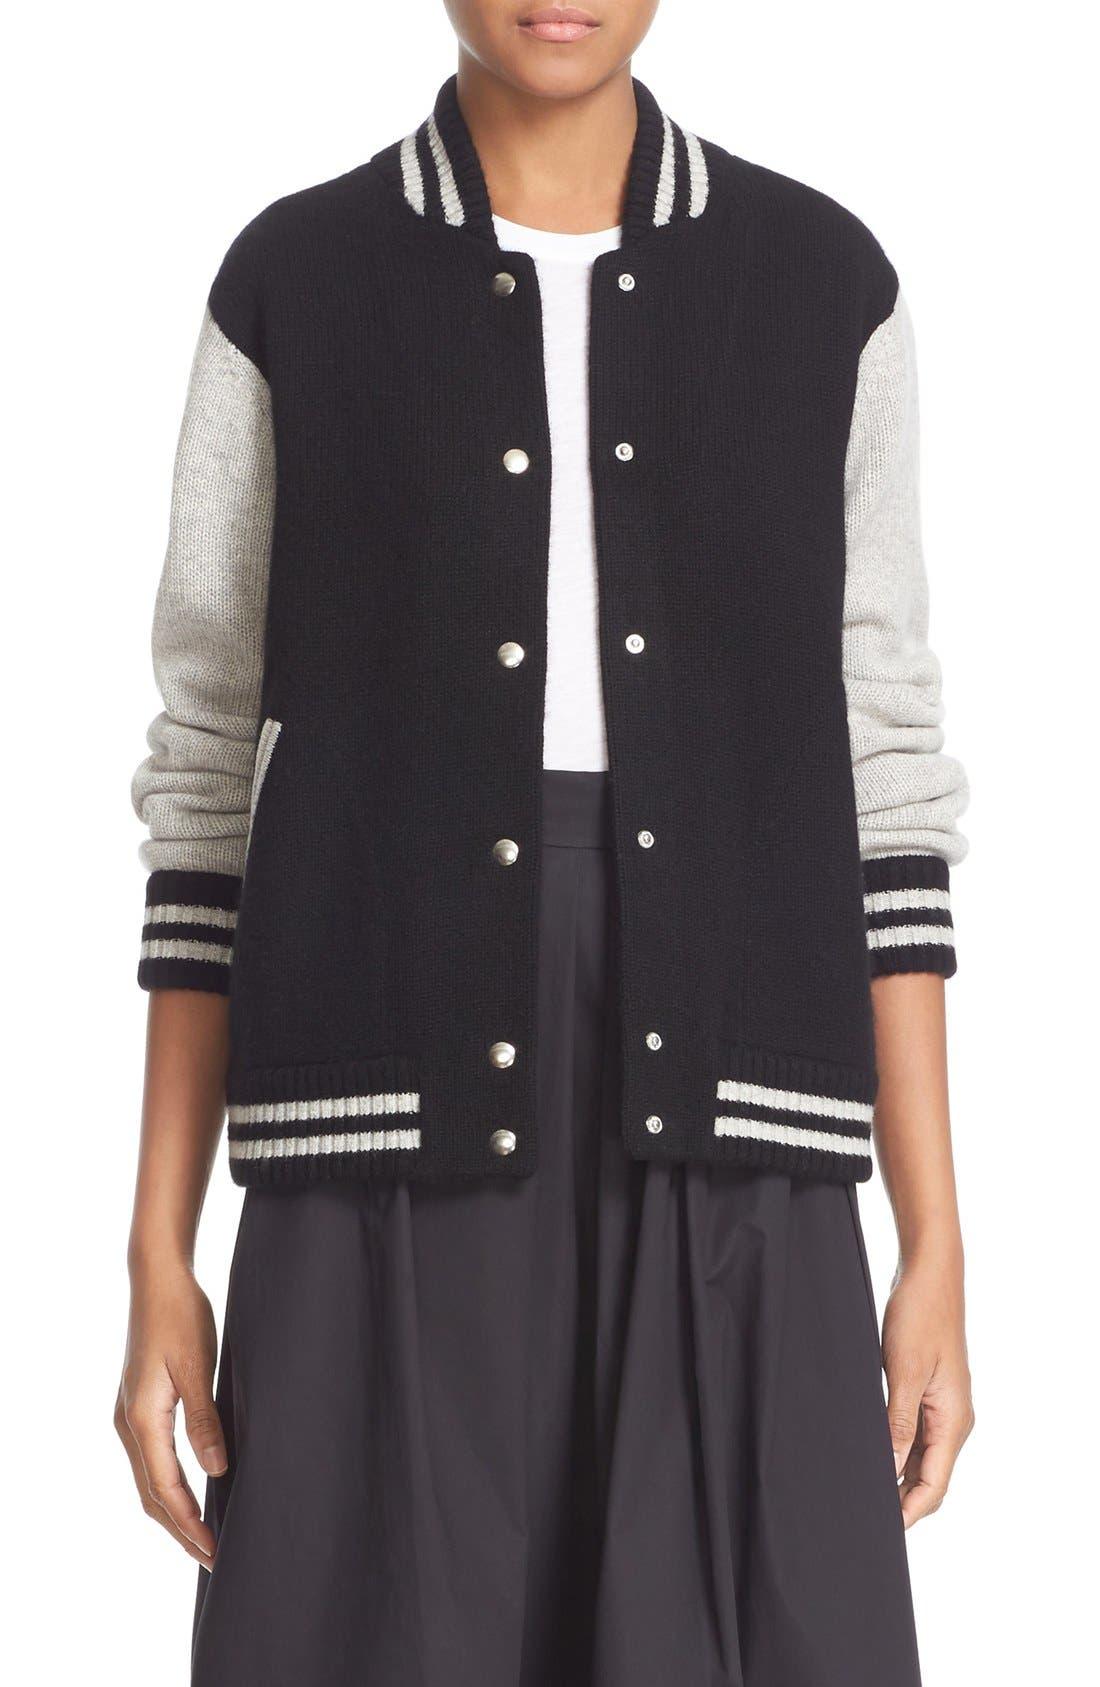 Main Image - MARC JACOBS Stripe Detail Wool & Cashmere Knit Varsity Jacket